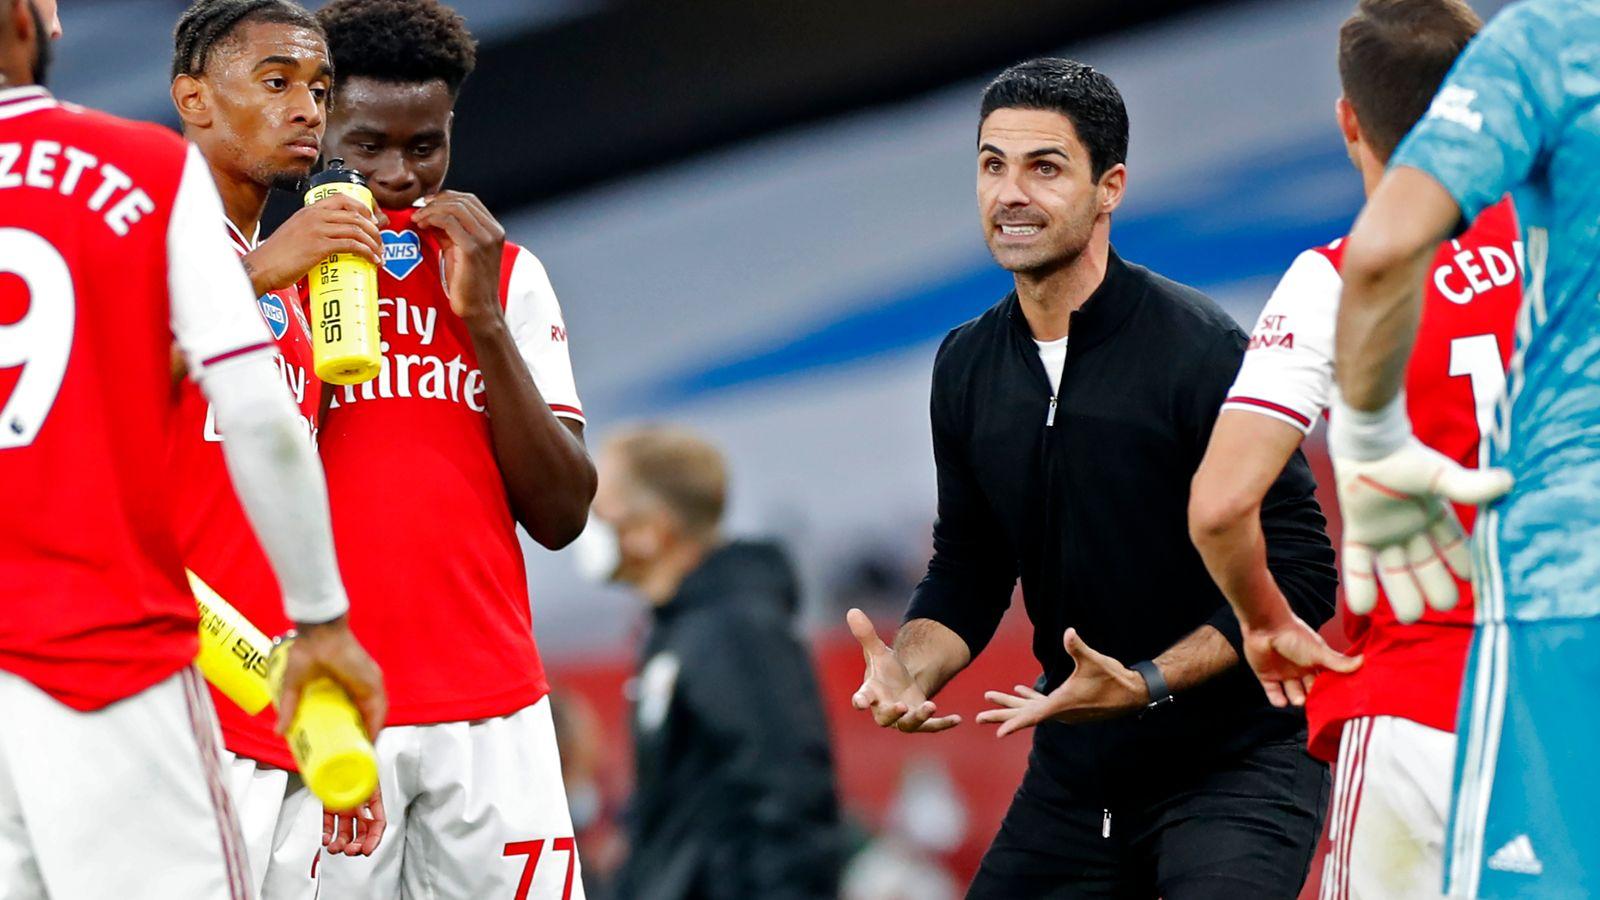 Mikel Arteta uncertain whether Arsenal will receive transfer market backing   Football News